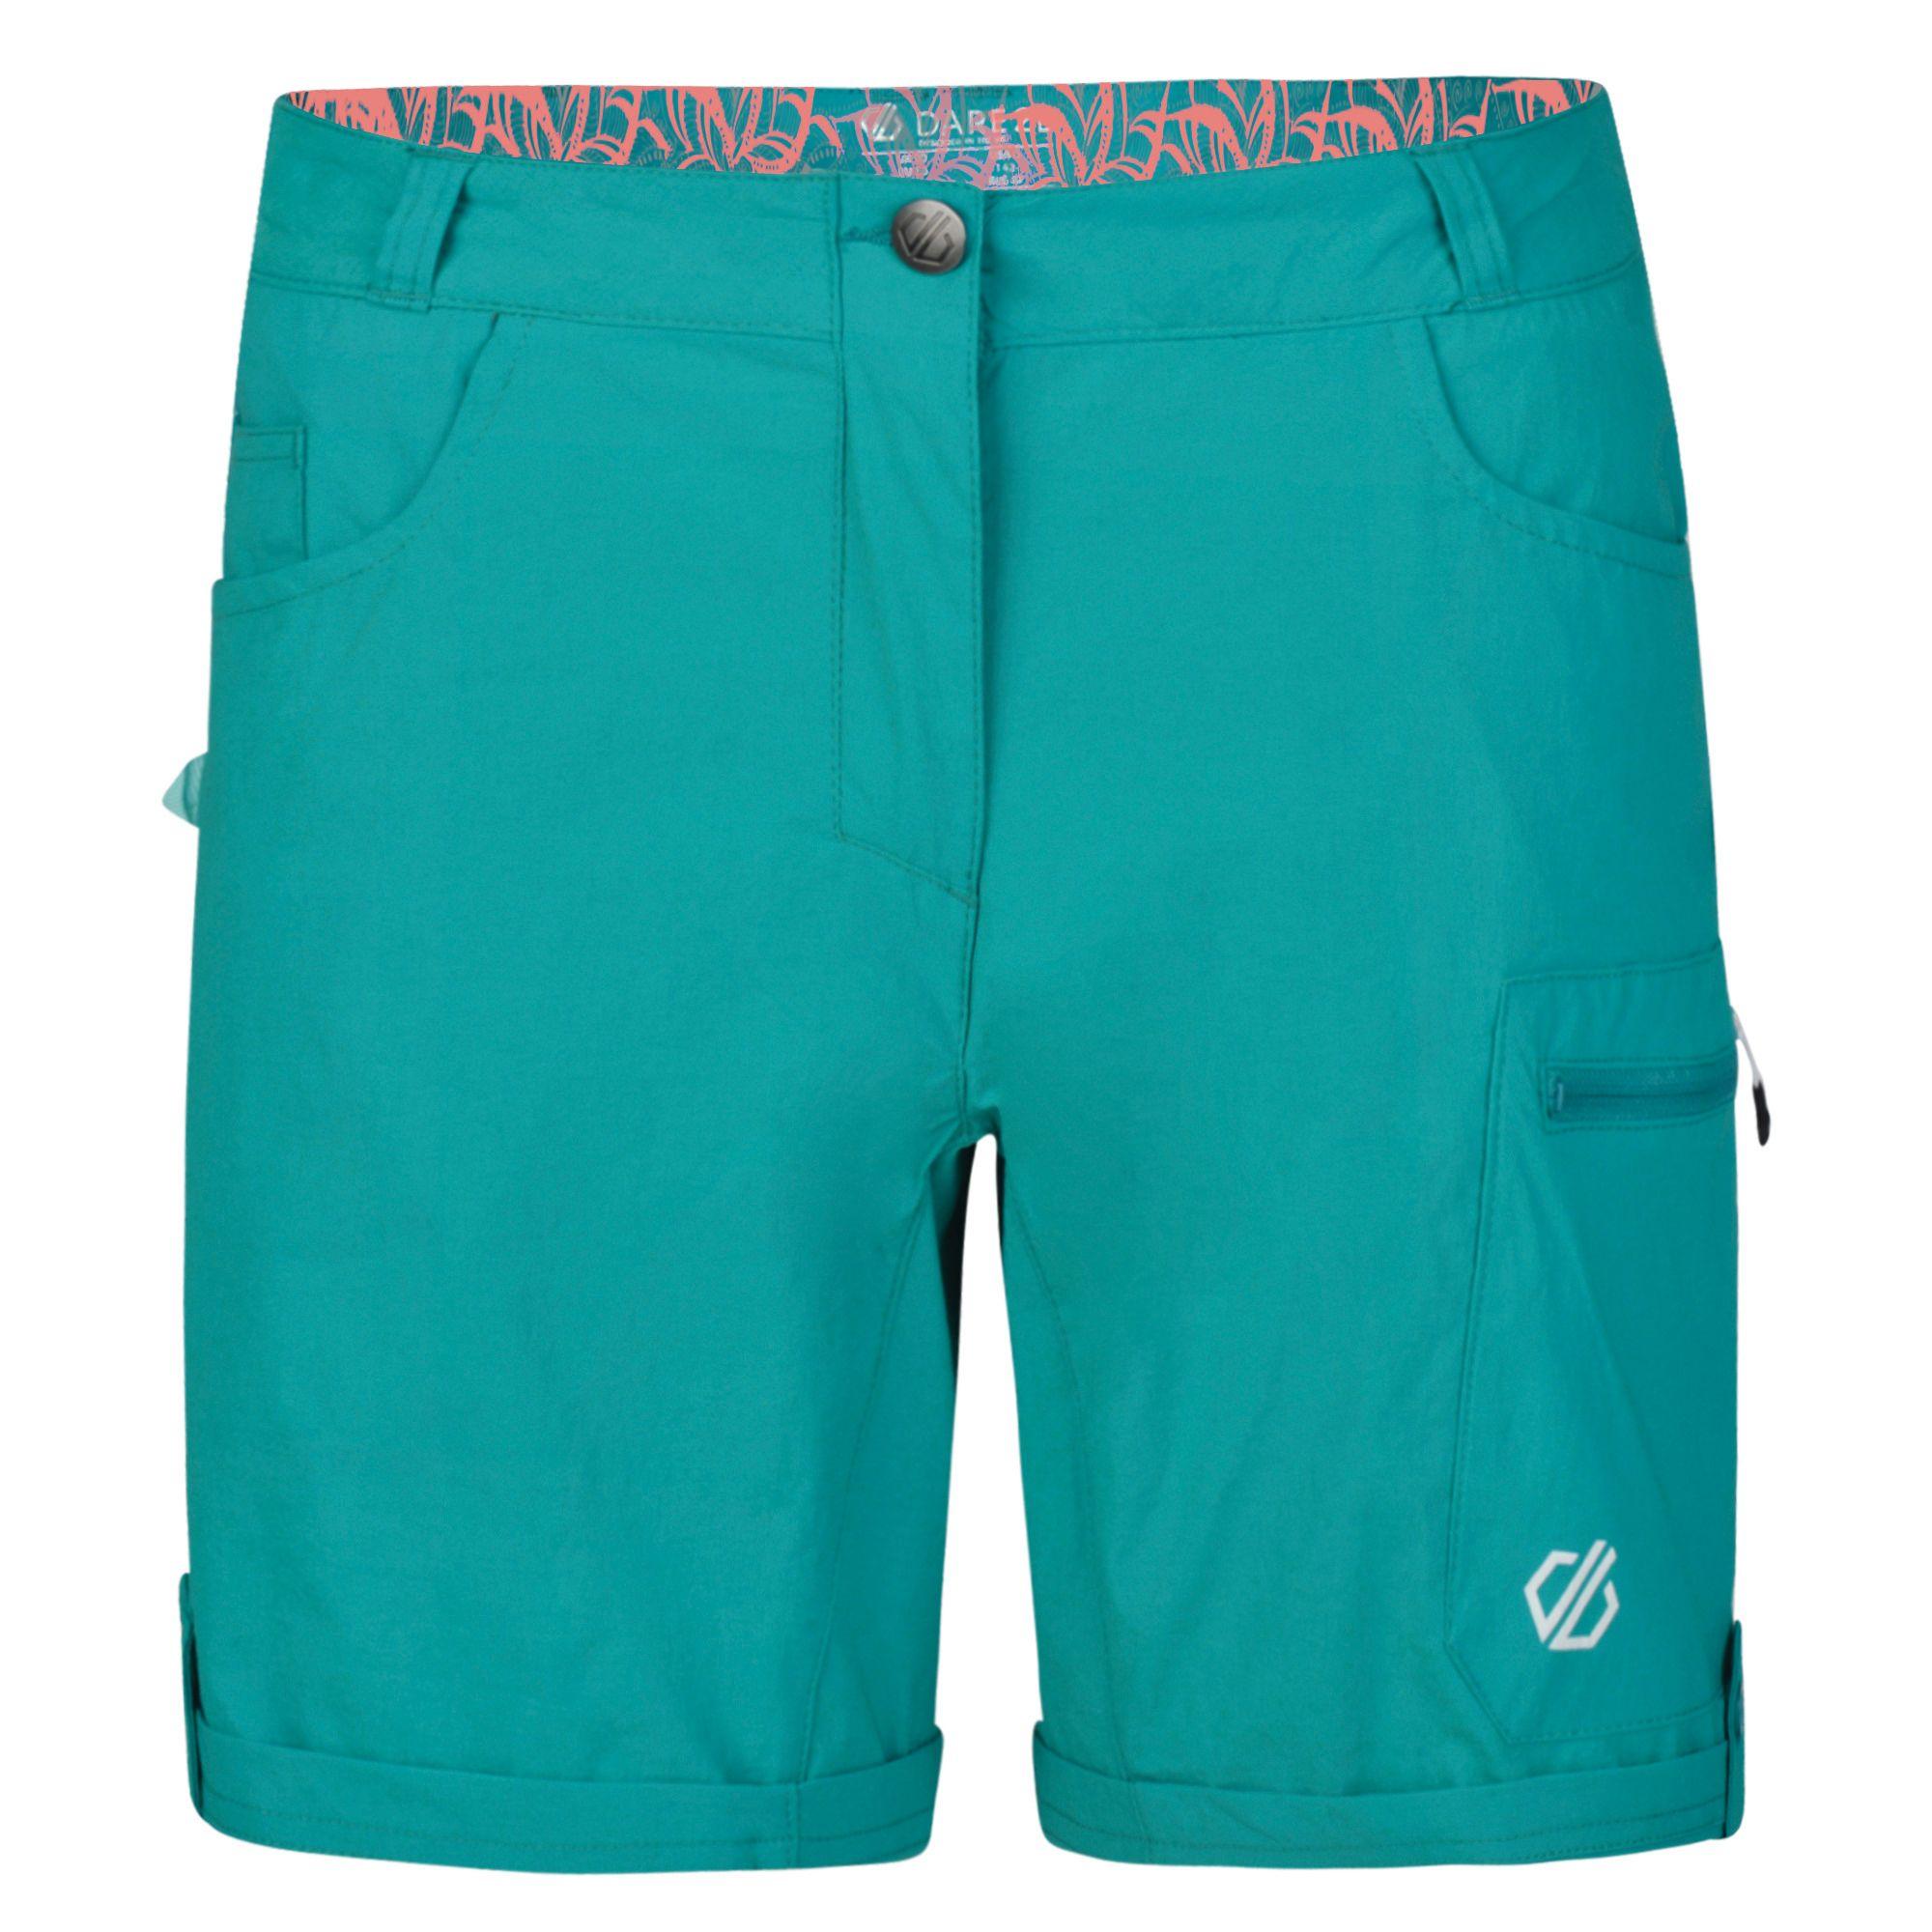 Dare2b Womens/Ladies Melodic II Multi Pocket Walking Shorts (12 UK) (Argent Grey)